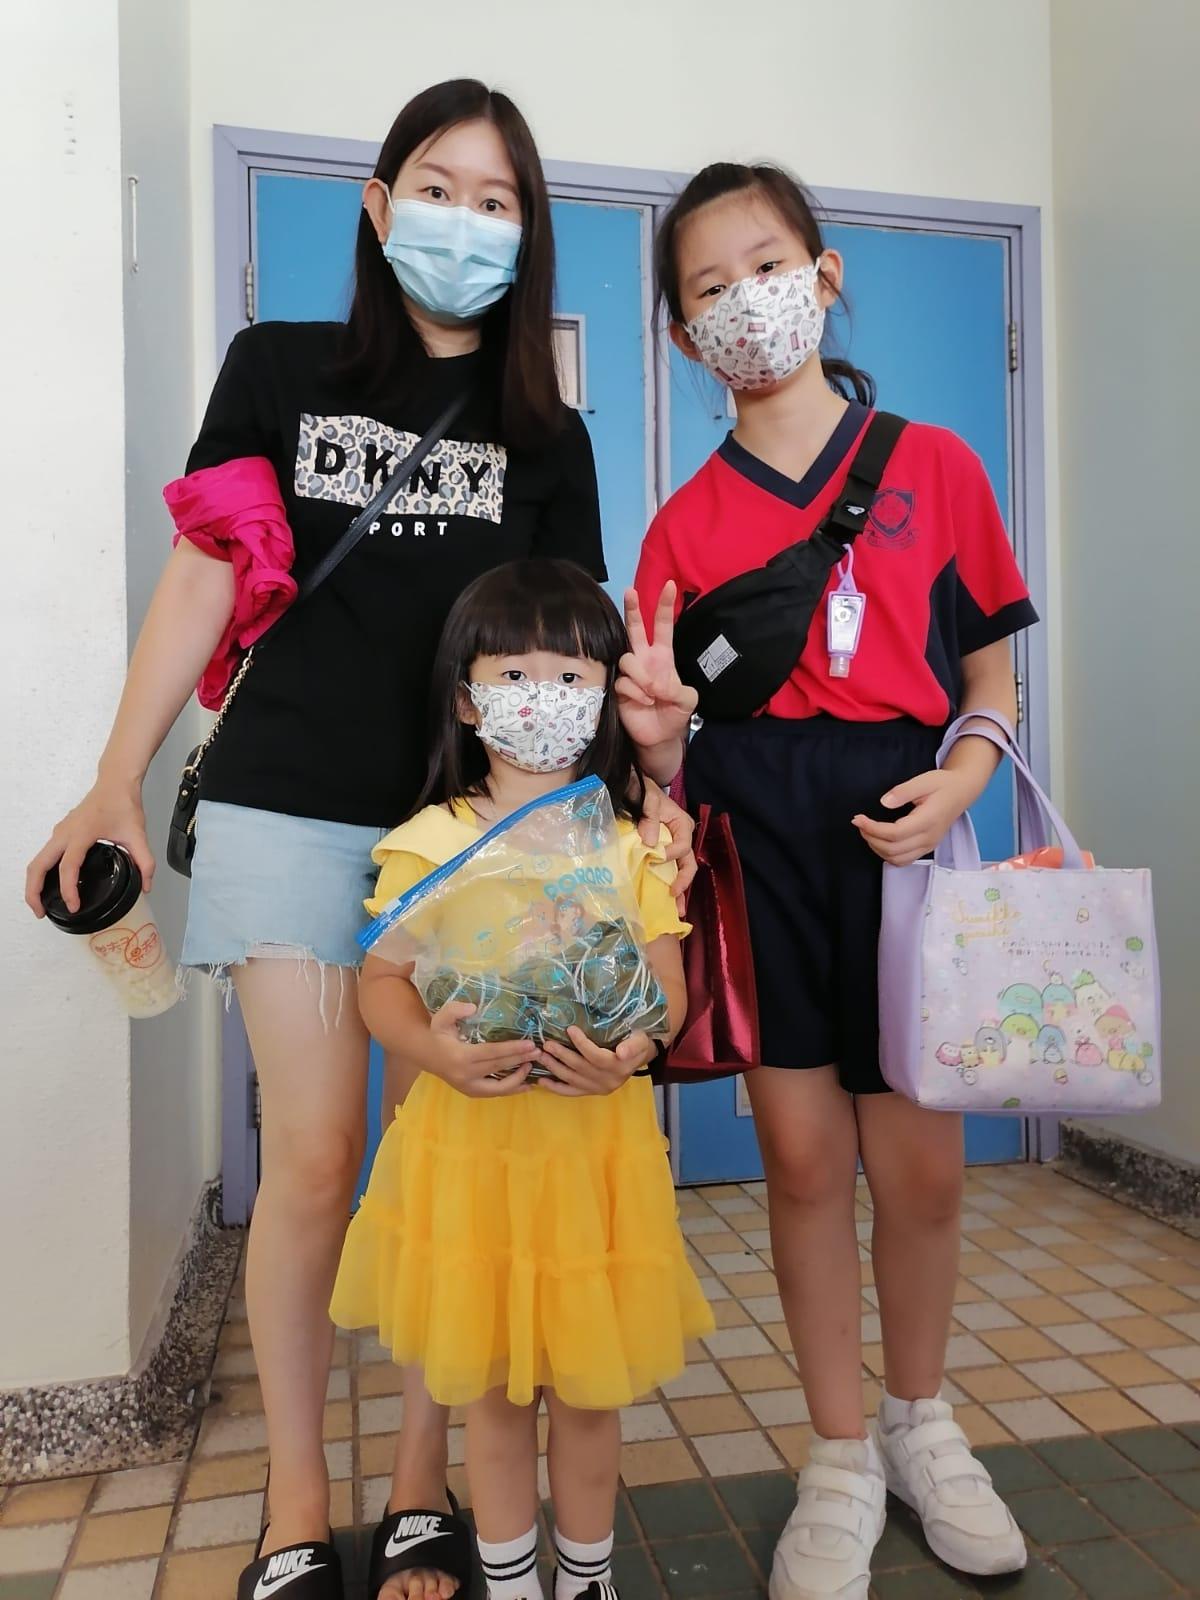 https://skhtswlo.edu.hk/sites/default/files/whatsapp_image_2021-06-02_at_10.21.09_5.jpeg